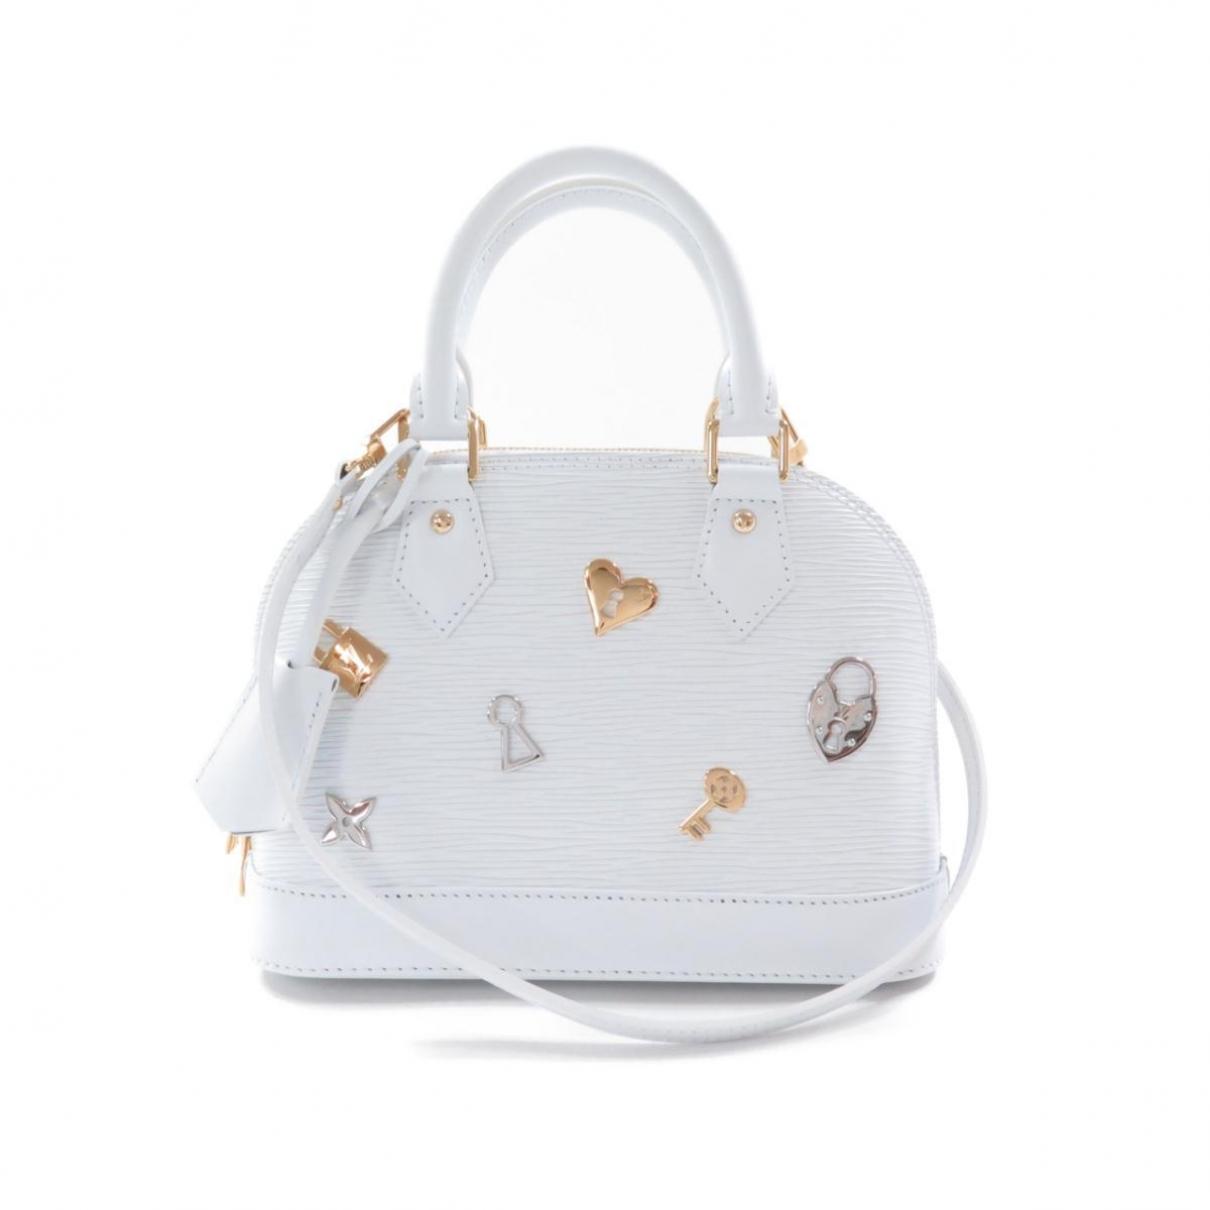 Louis Vuitton Alma BB White Leather handbag for Women \N